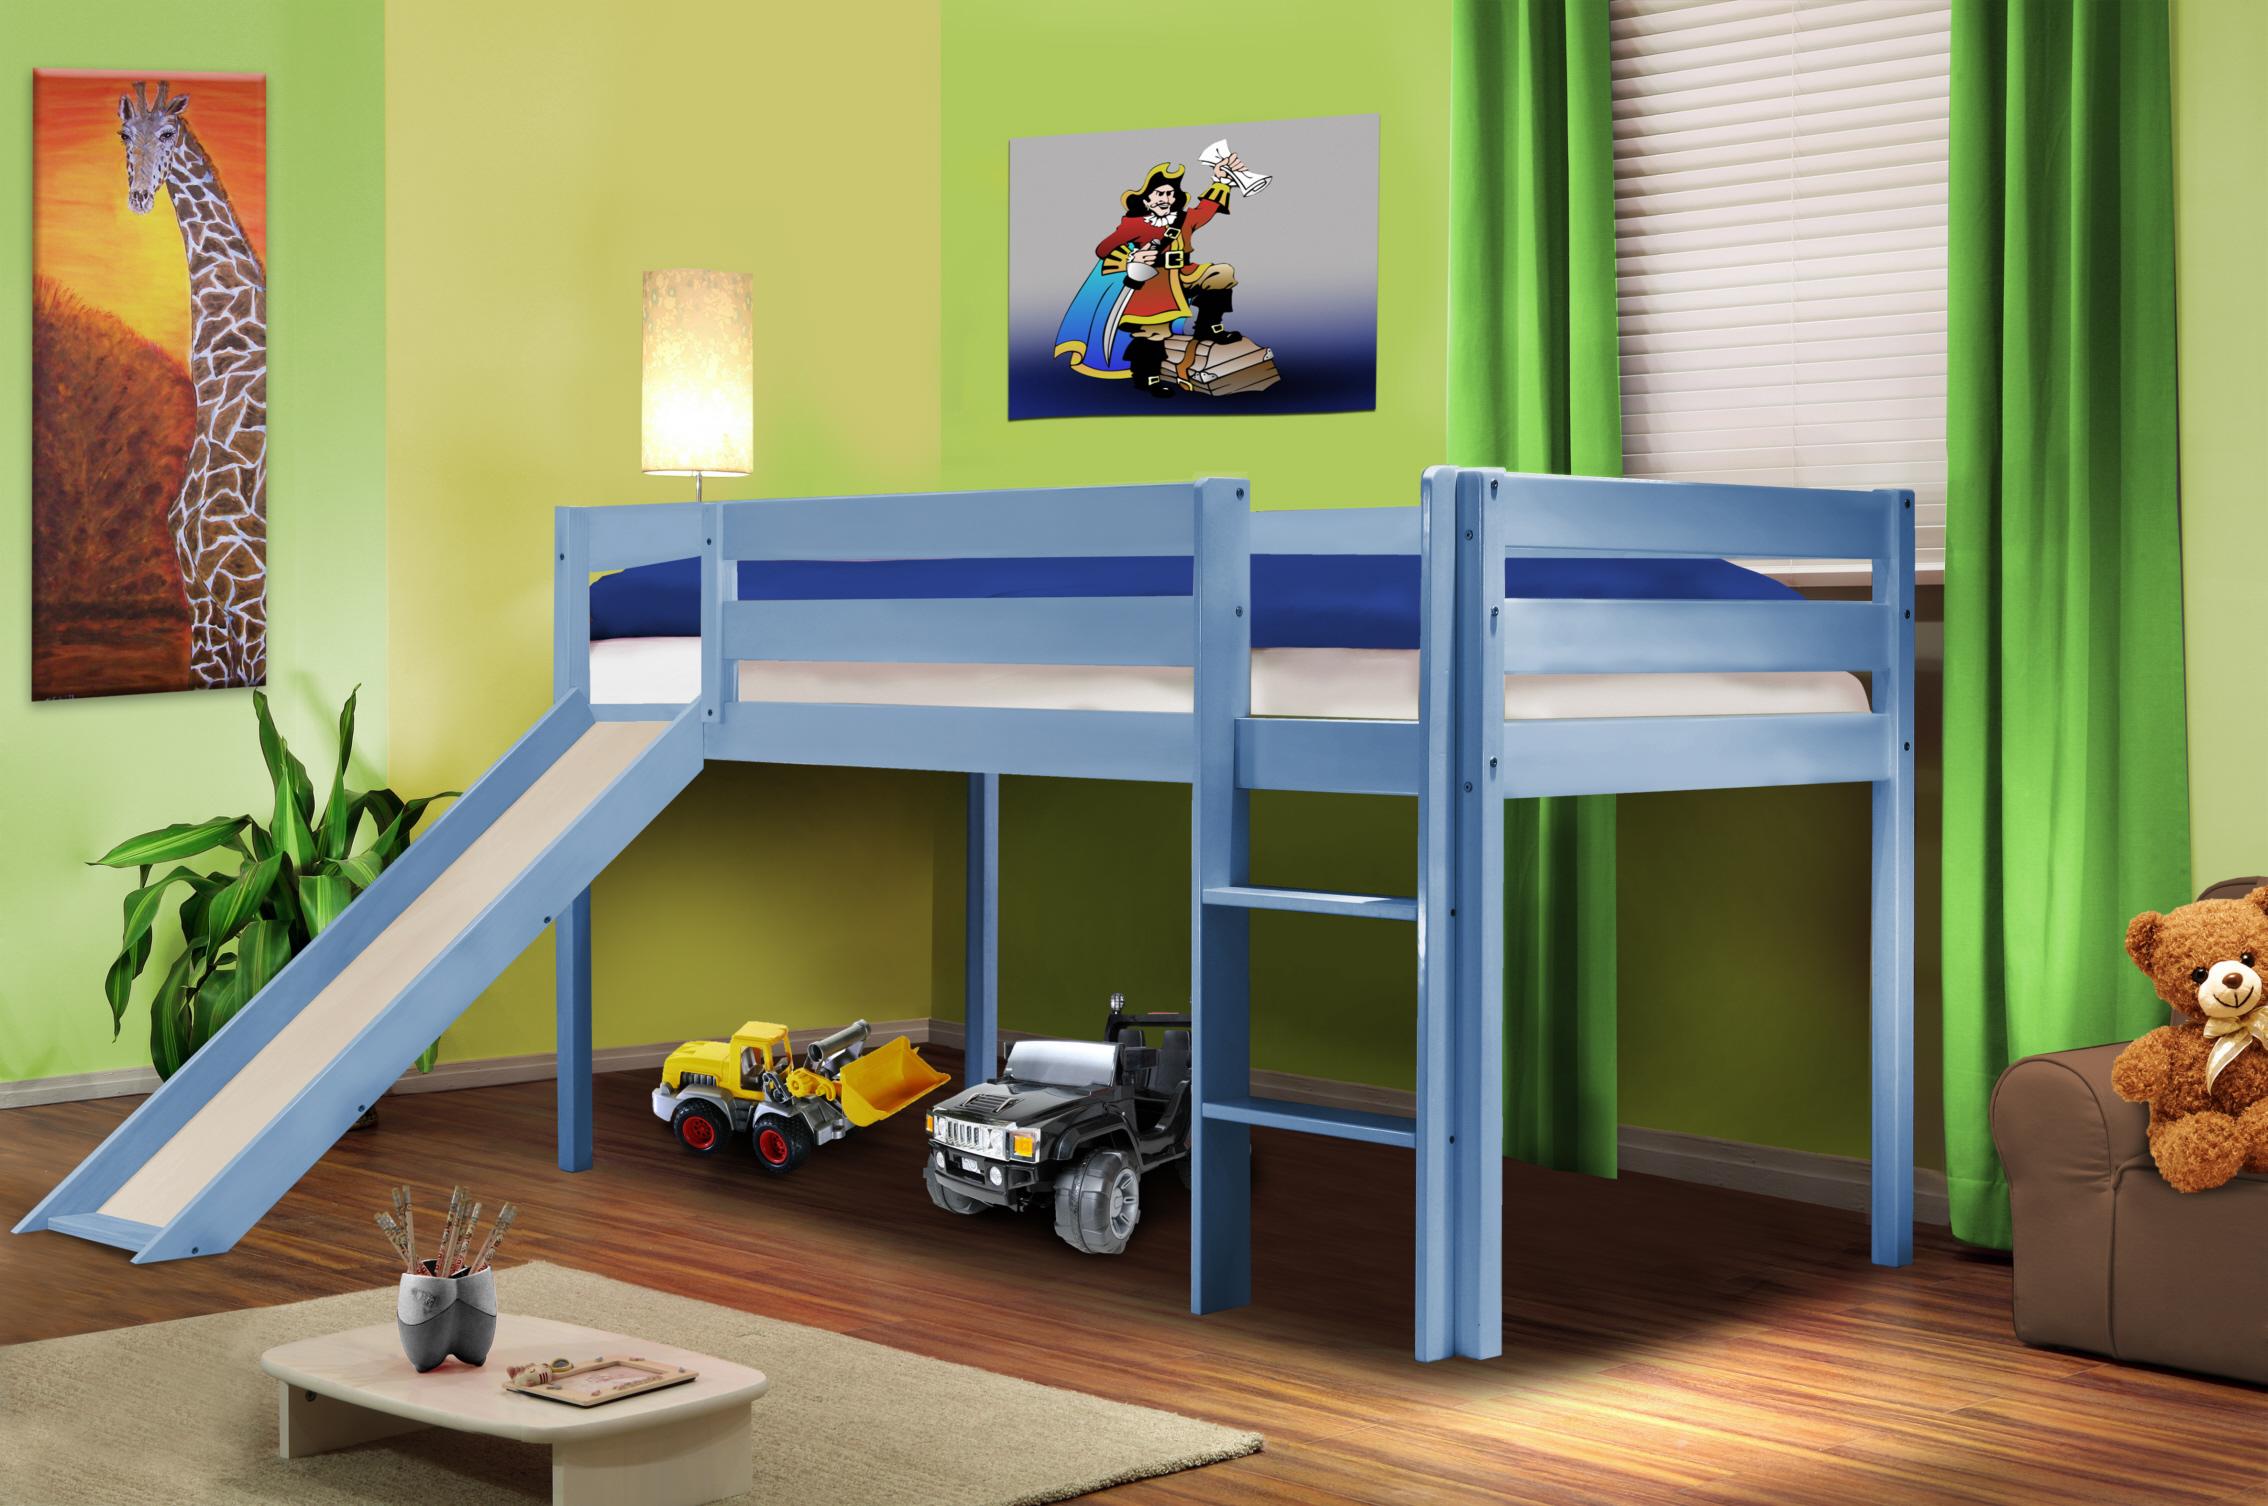 hochbett kinderbett spielbett mit rutsche massiv kiefer. Black Bedroom Furniture Sets. Home Design Ideas